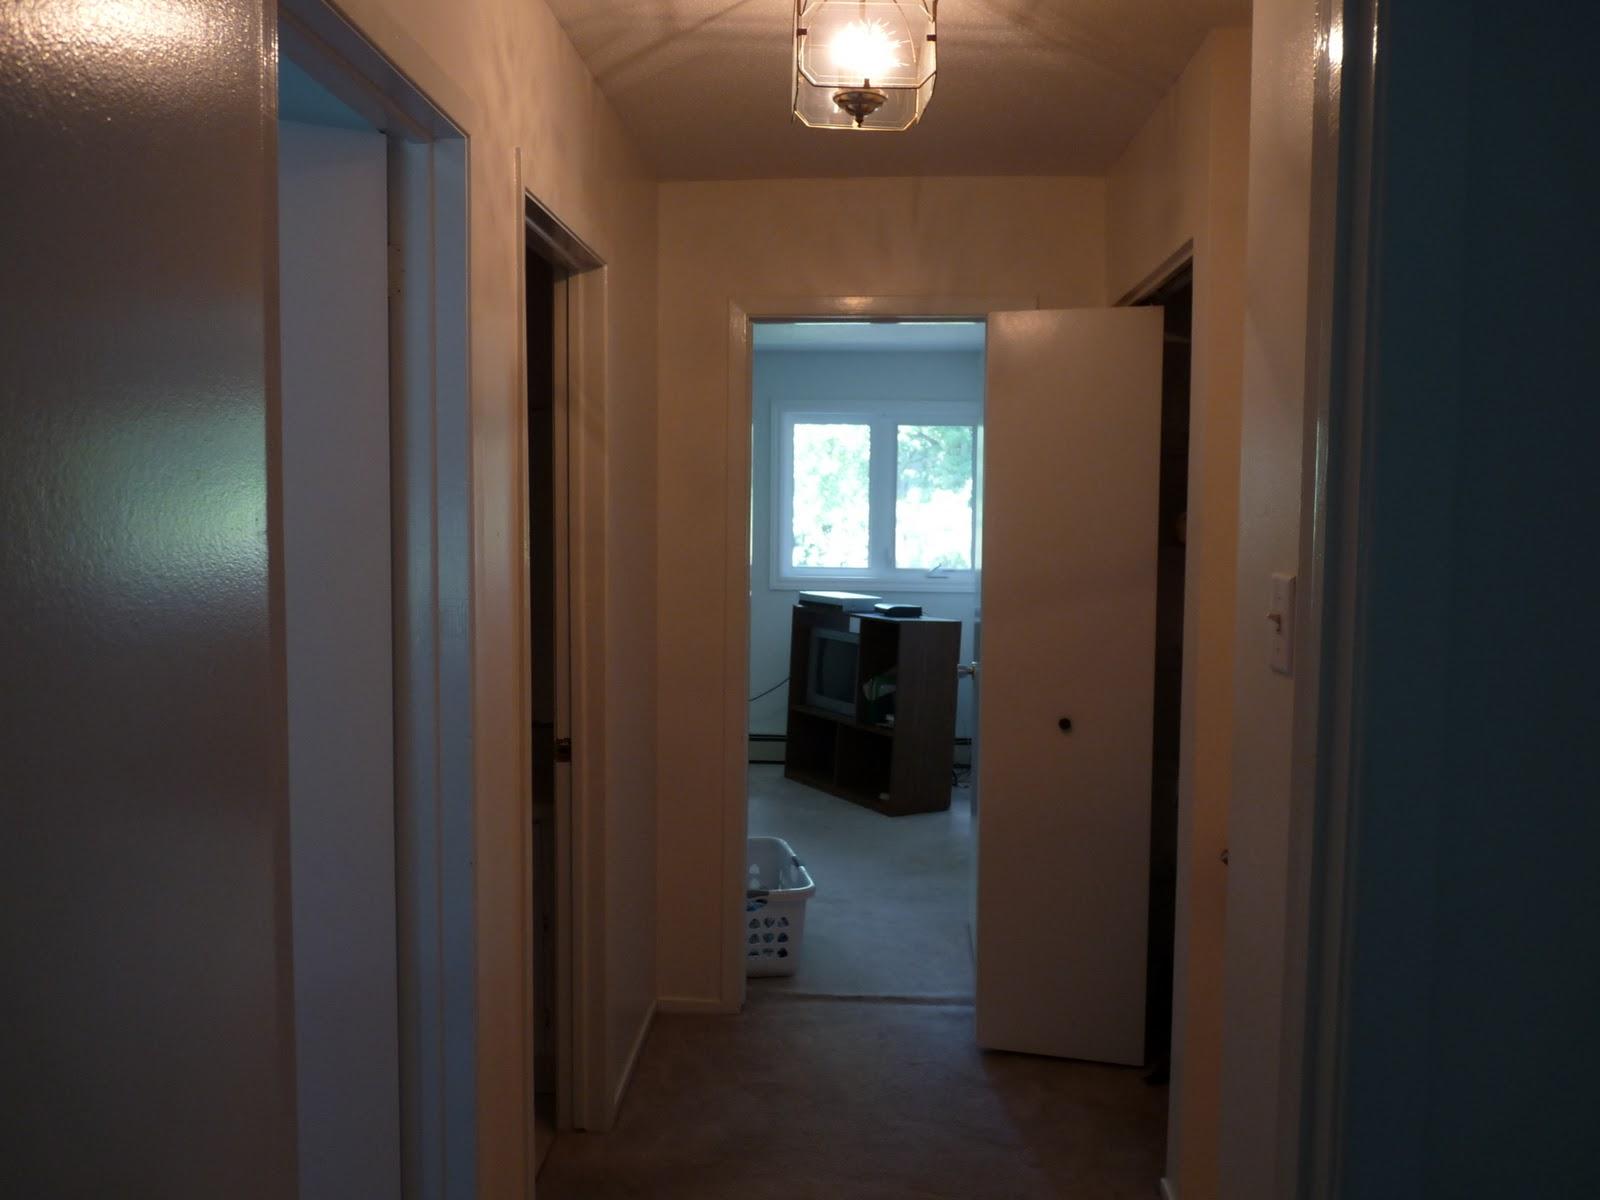 Diy Hardwood Floors Dans Le Lakehouse How To Lay A Floor Hallway Before Note The Ripple